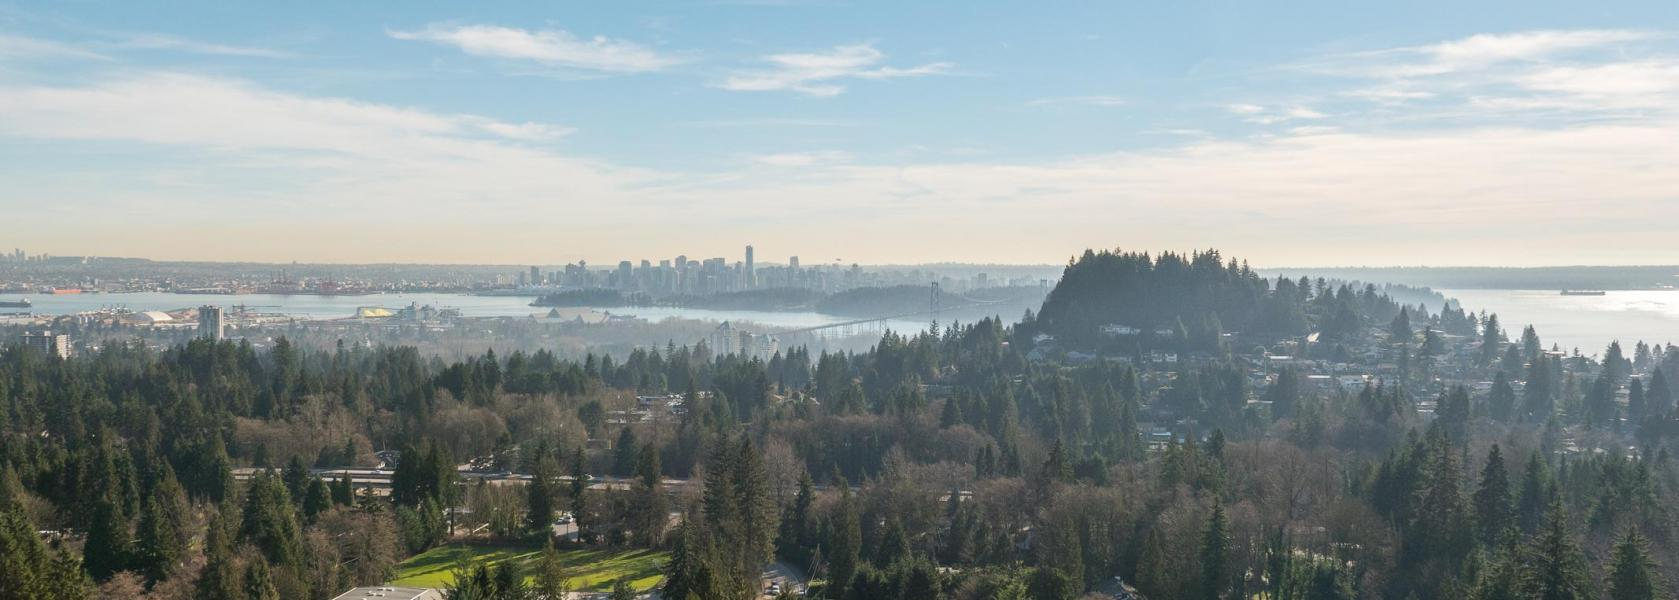 727 Parkside Road, British Properties, West Vancouver